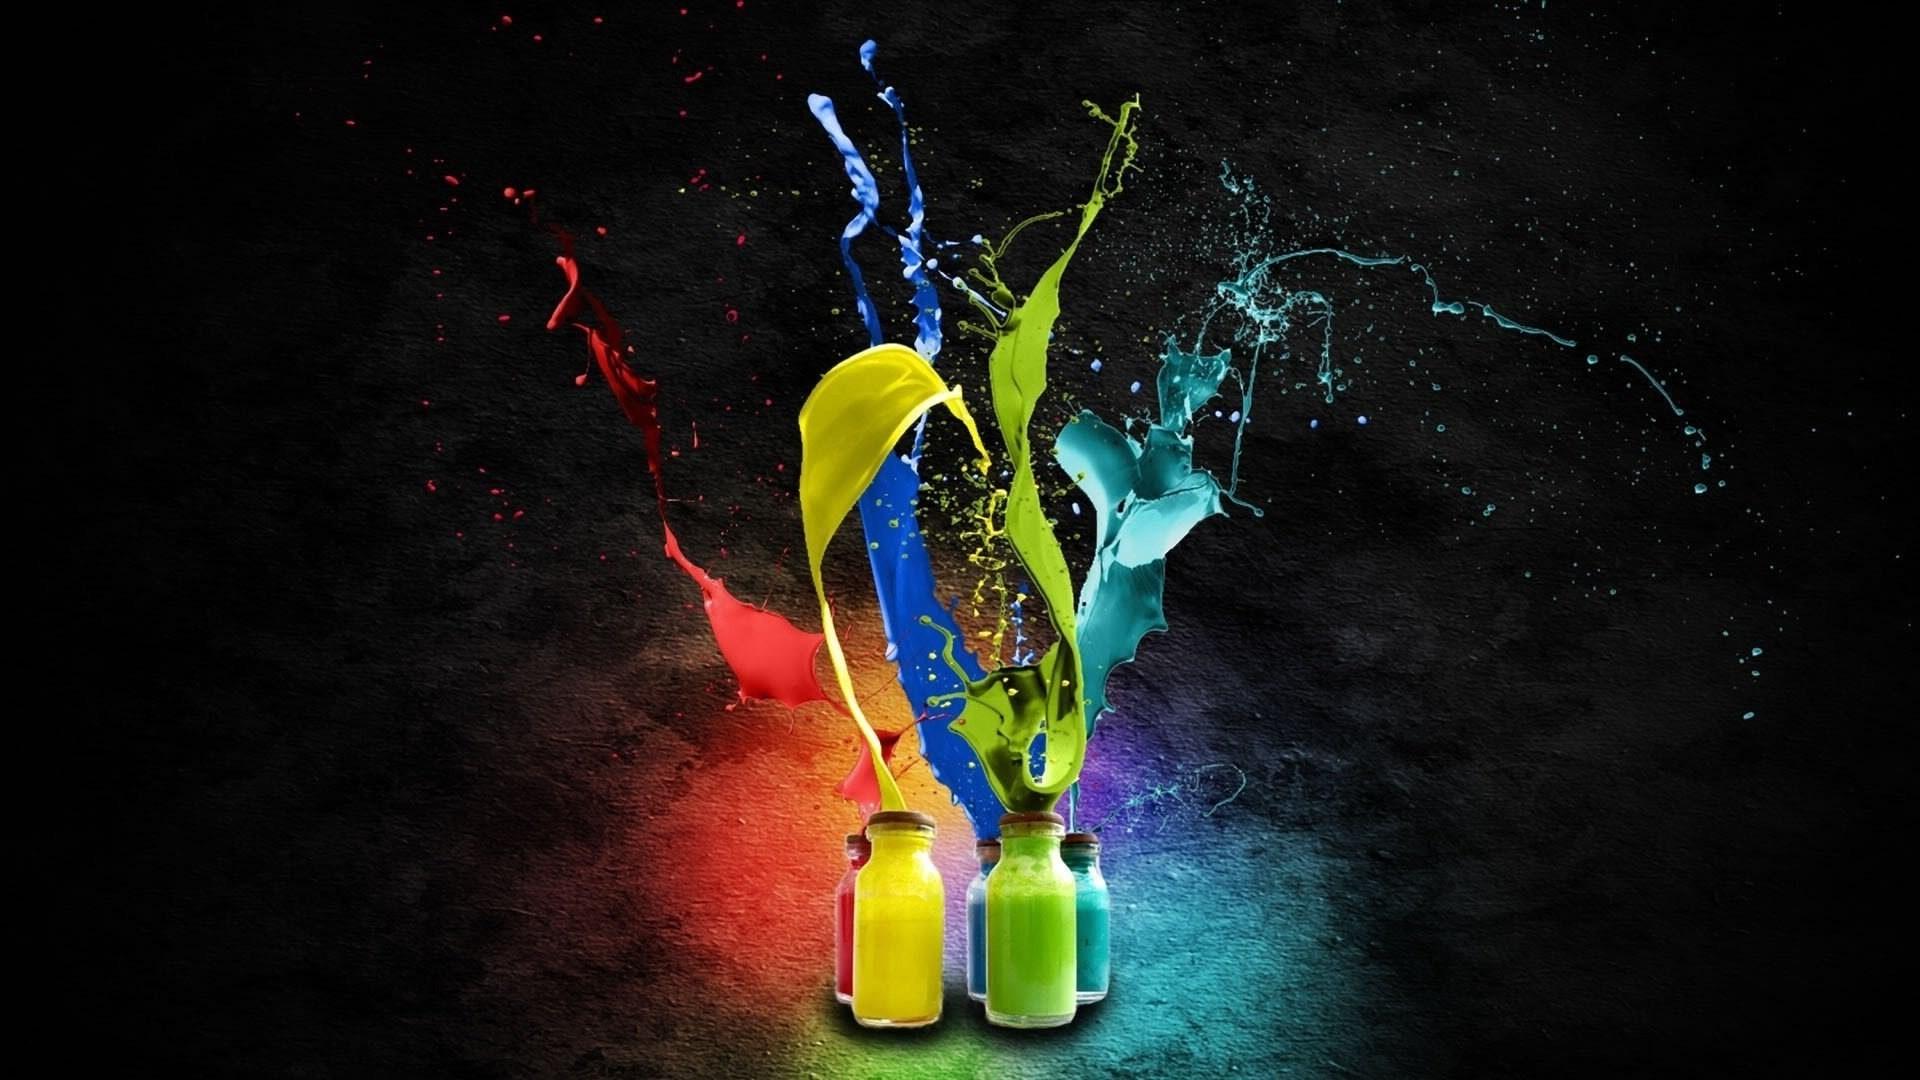 Colorful Digital Art Simple Background Black Night Bottles Space Texture Paint Splatter Splashes Light Color